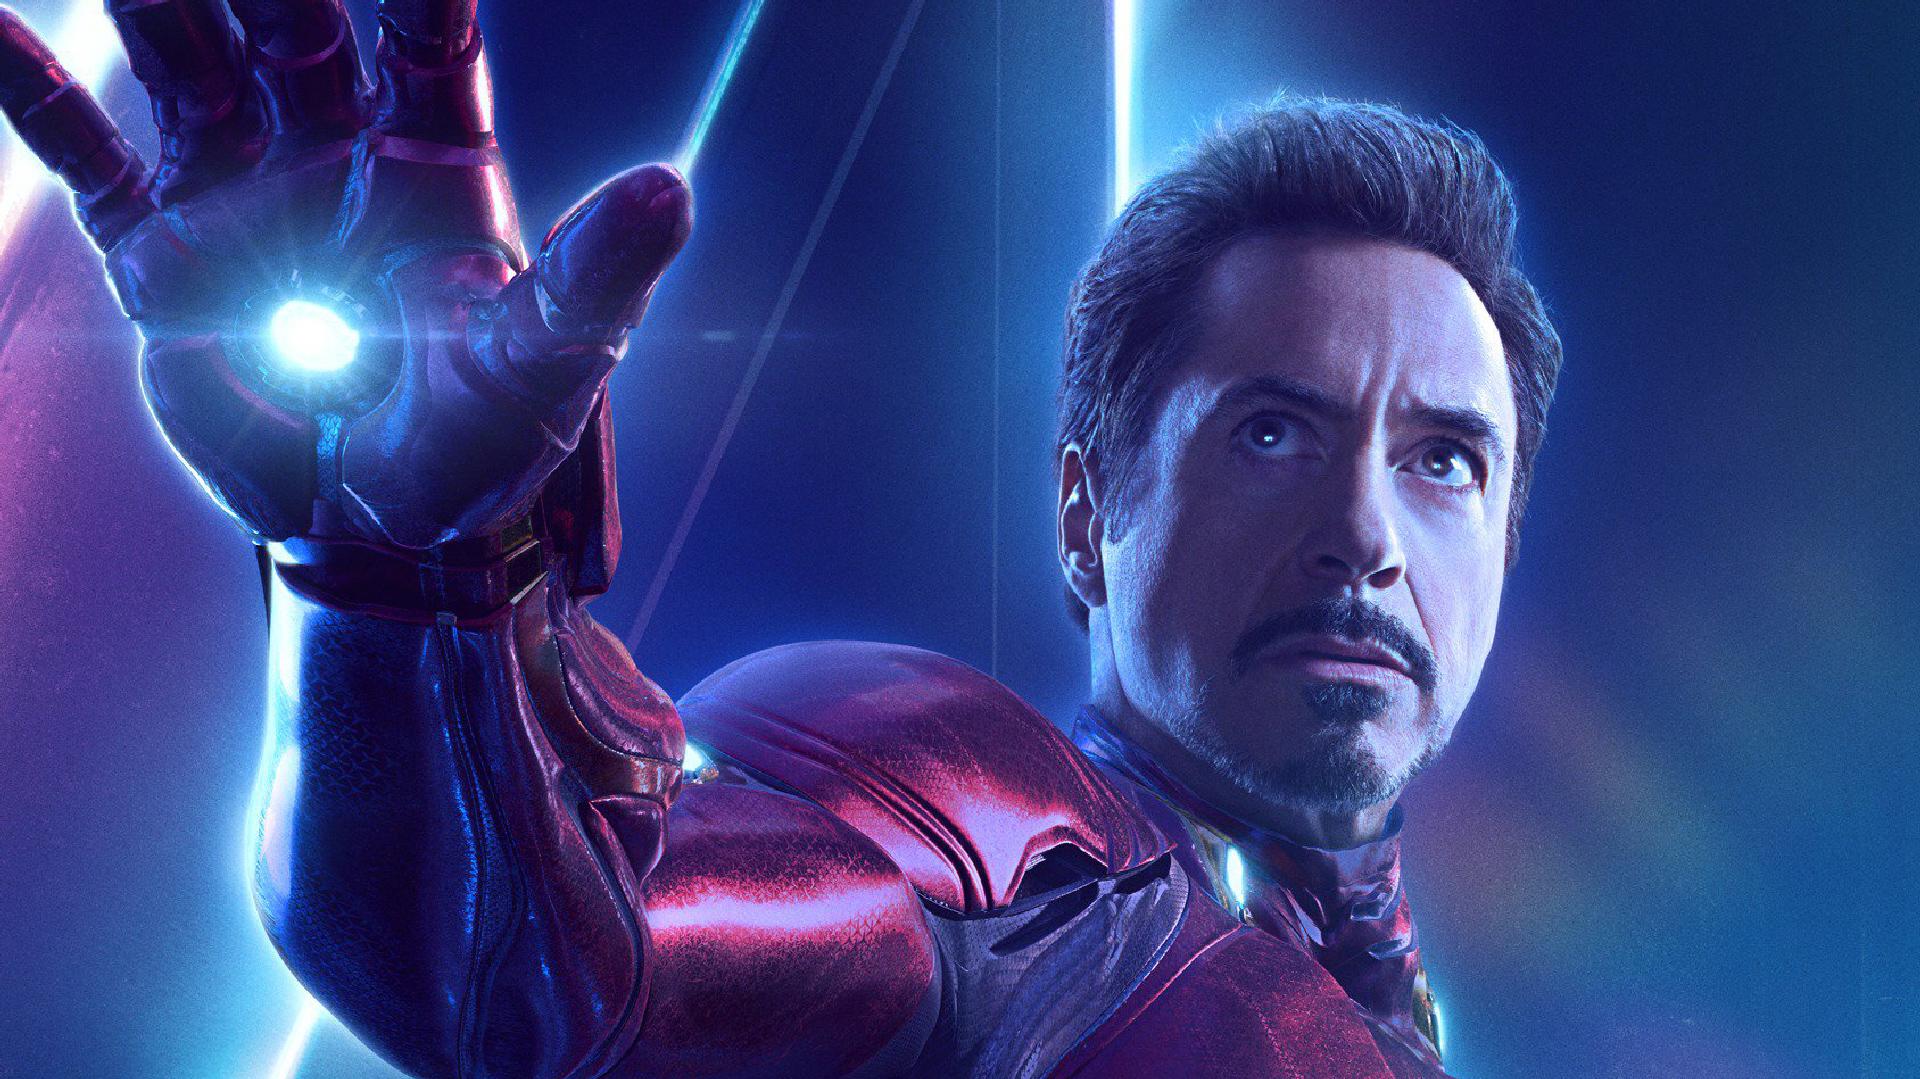 Shuri In Avengers Infinity War New Poster Hd Movies 4k: Iron Man In Avengers Infinity War New Poster, HD Movies